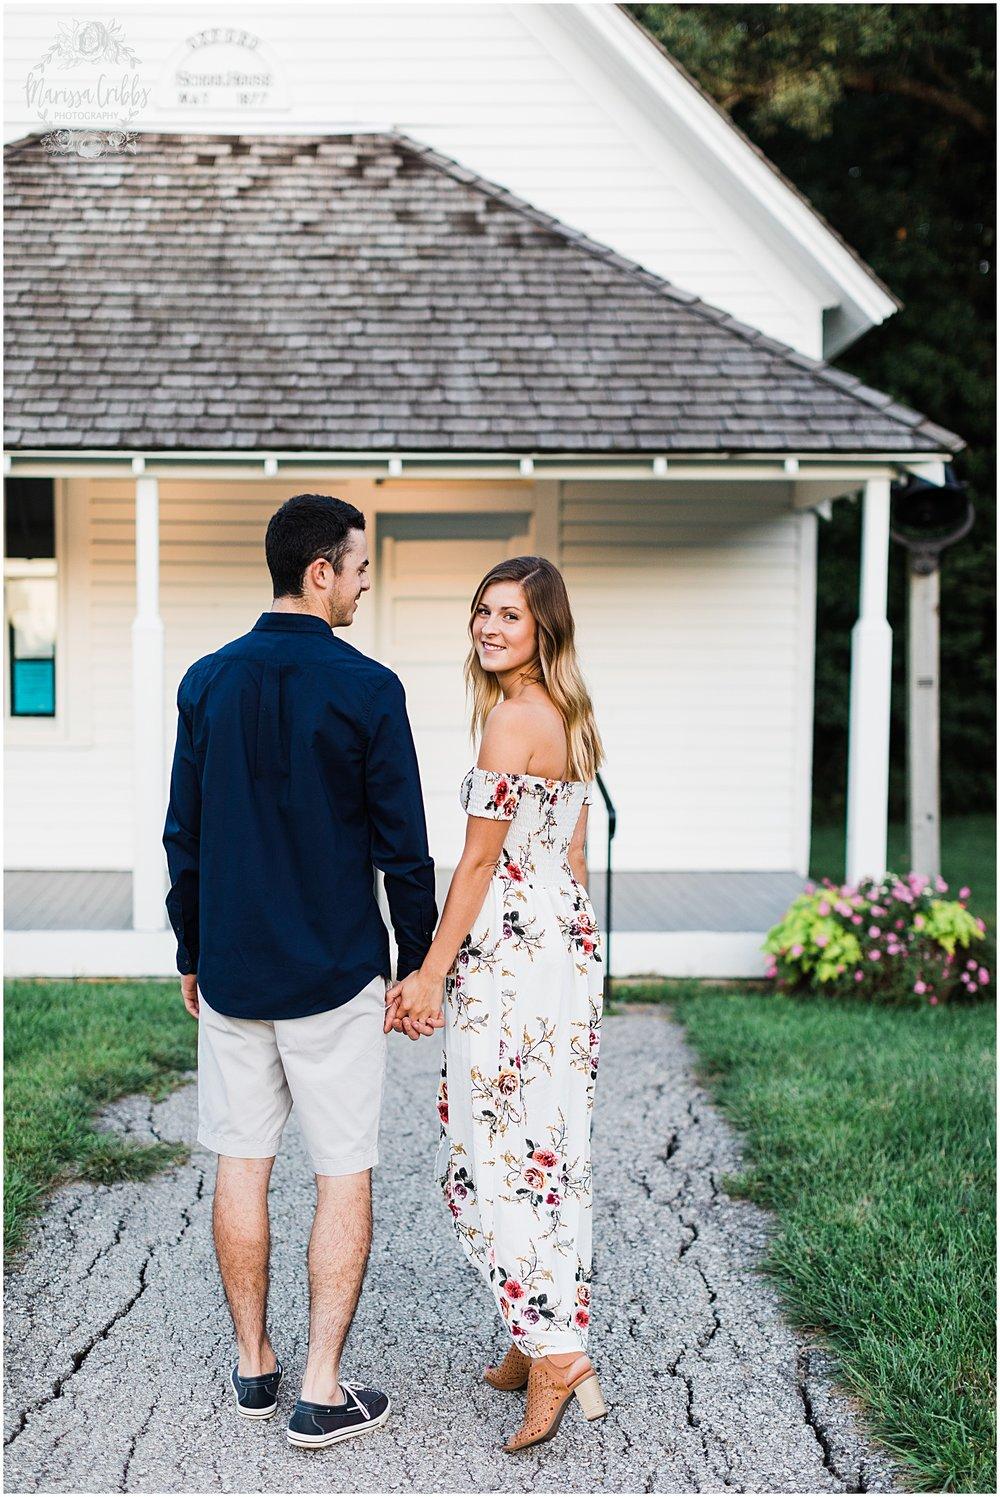 Leah & AJ Engagement | Marissa Cribbs Photography_6220.jpg